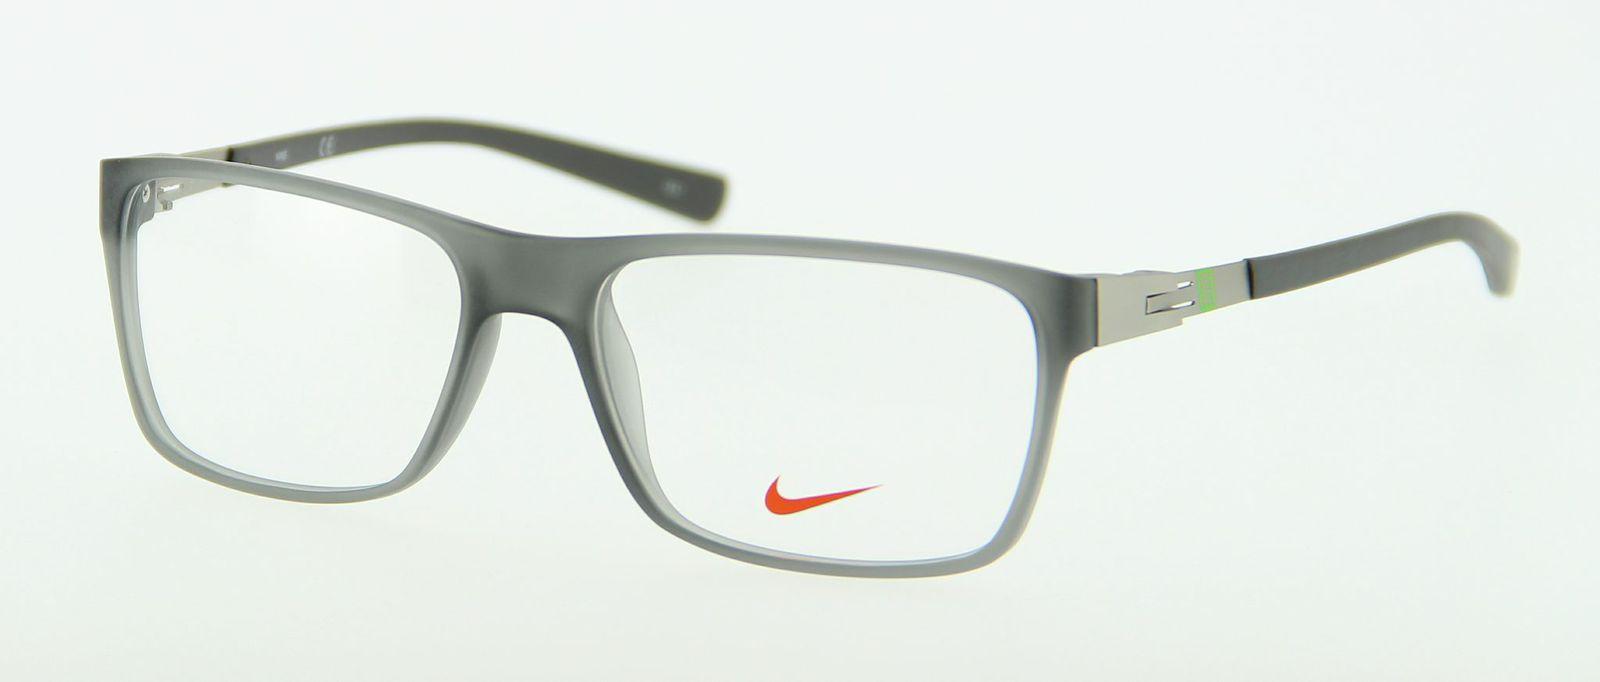 NikeMens2.jpg